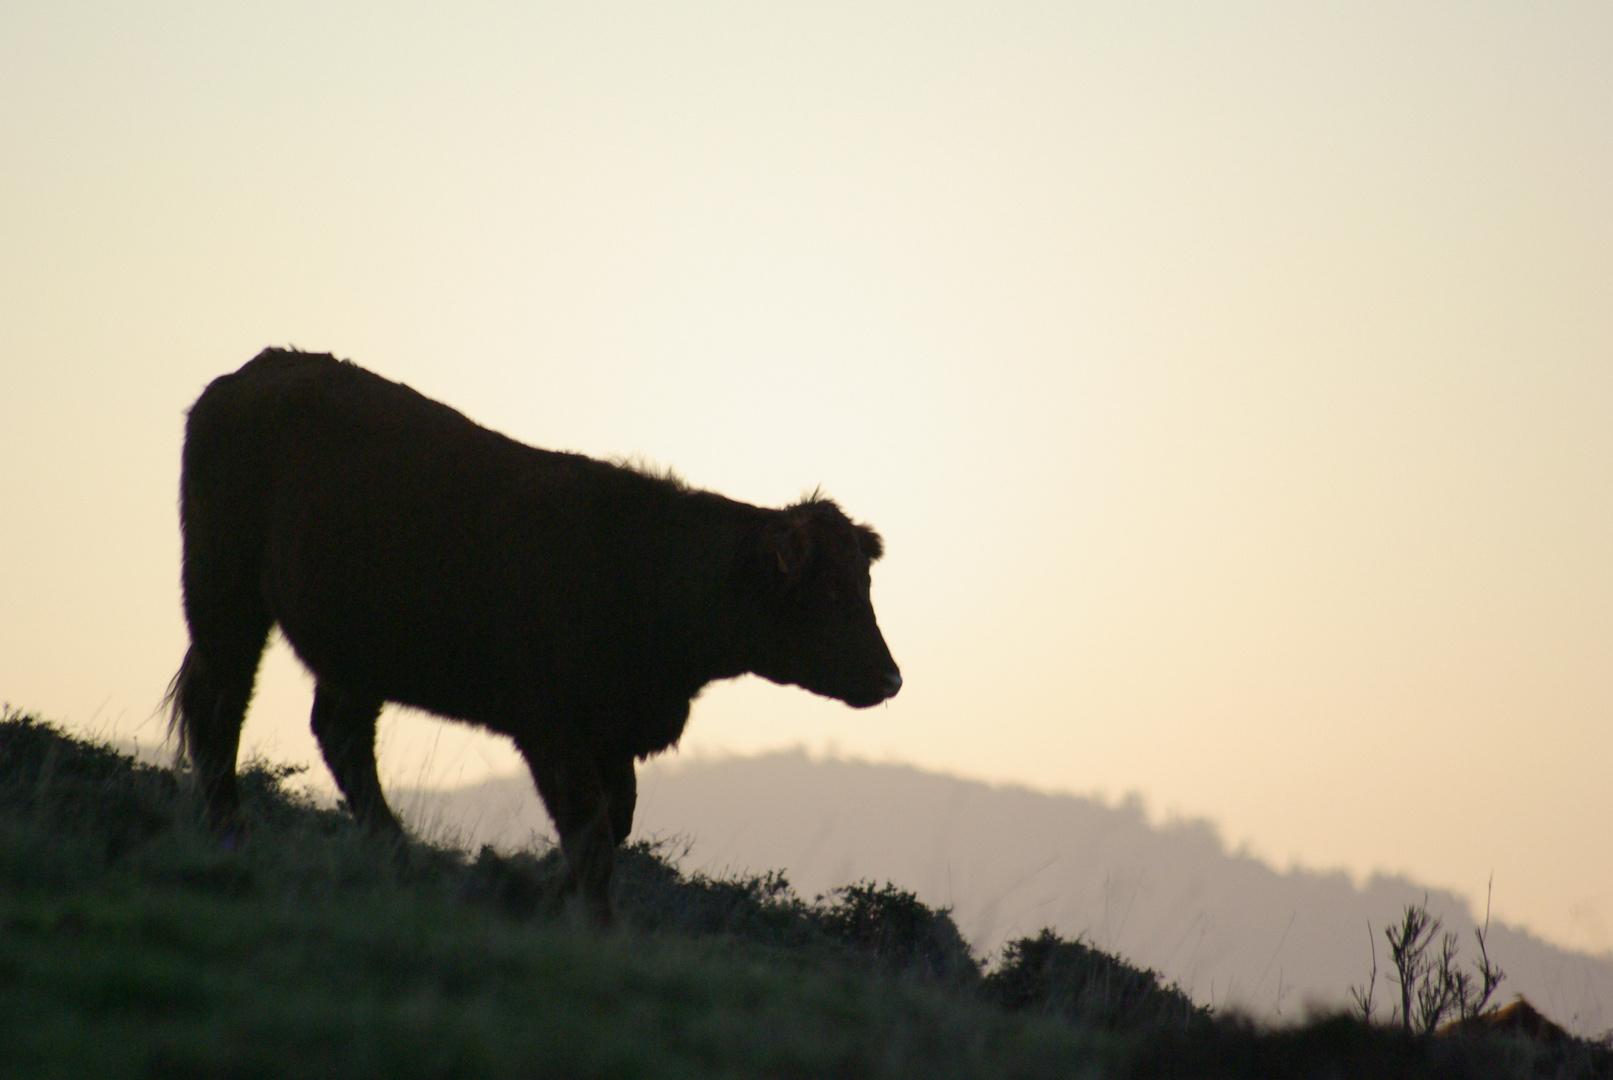 Vache - Grendelbruch